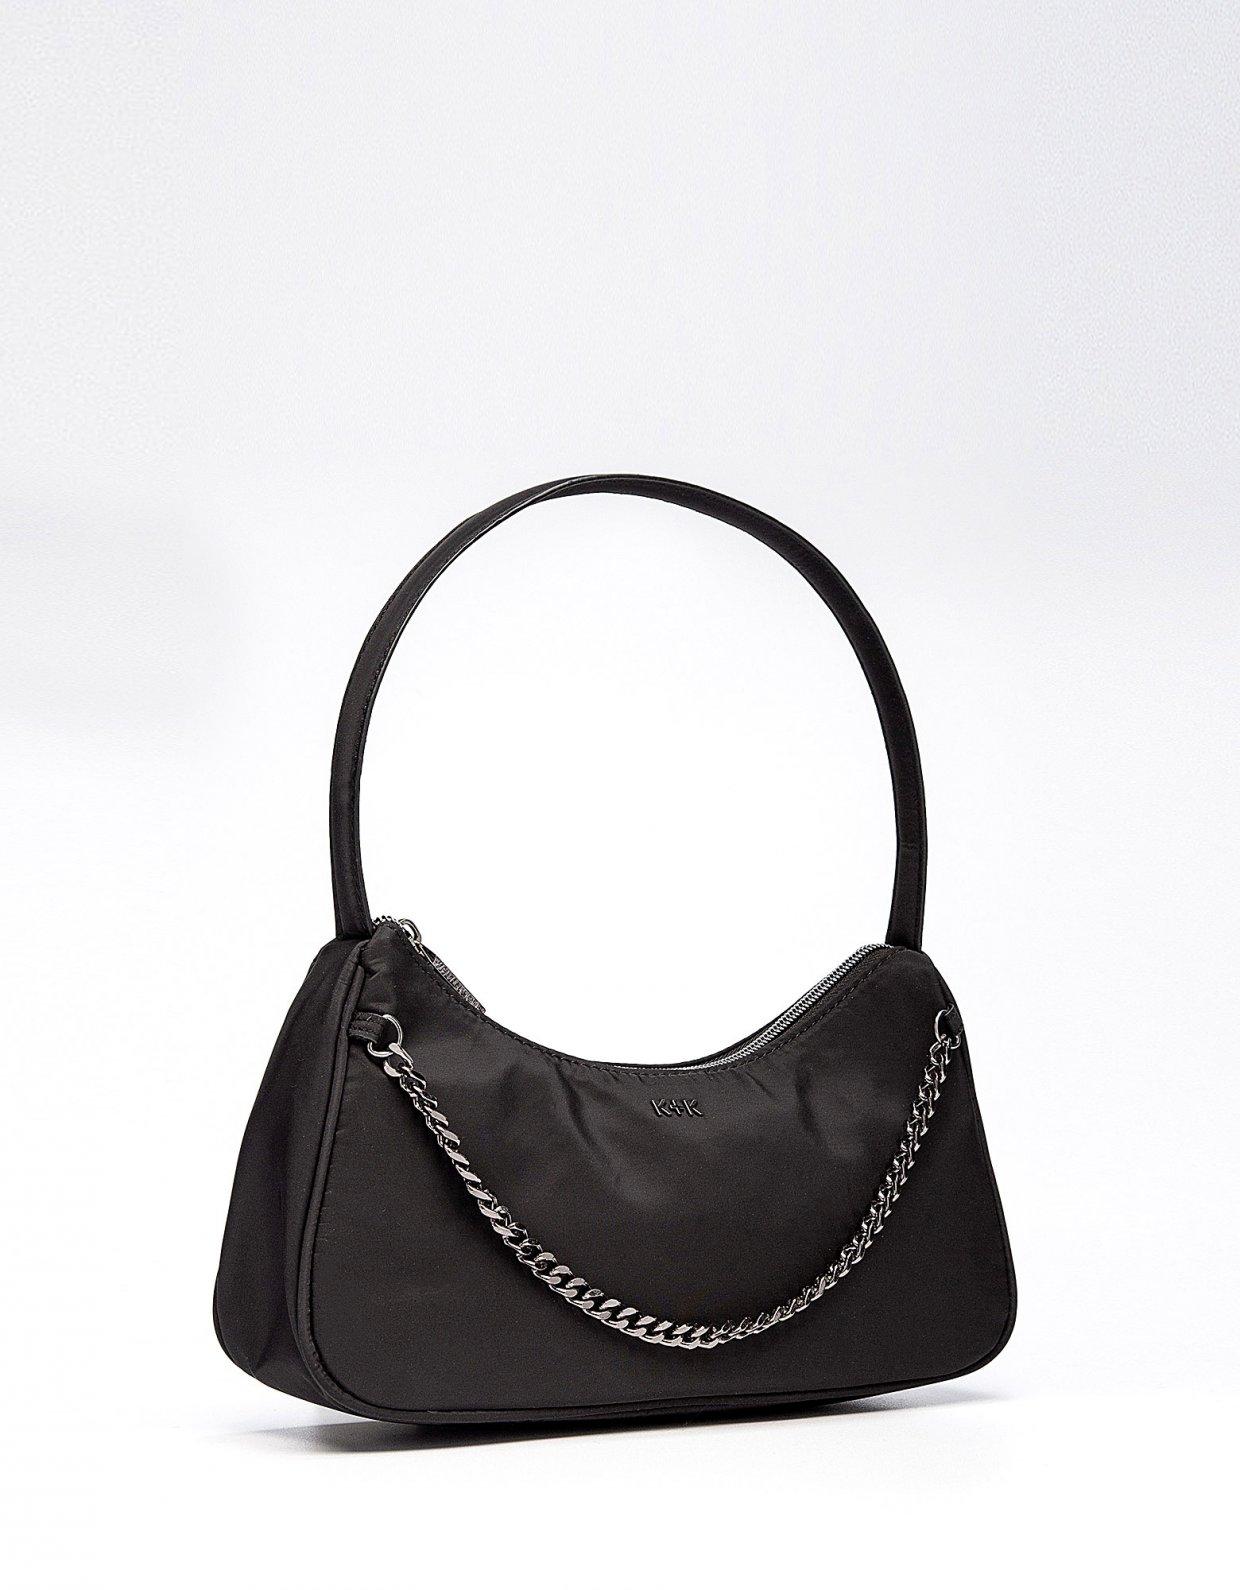 Kendall + Kylie Haisley hobo bag black